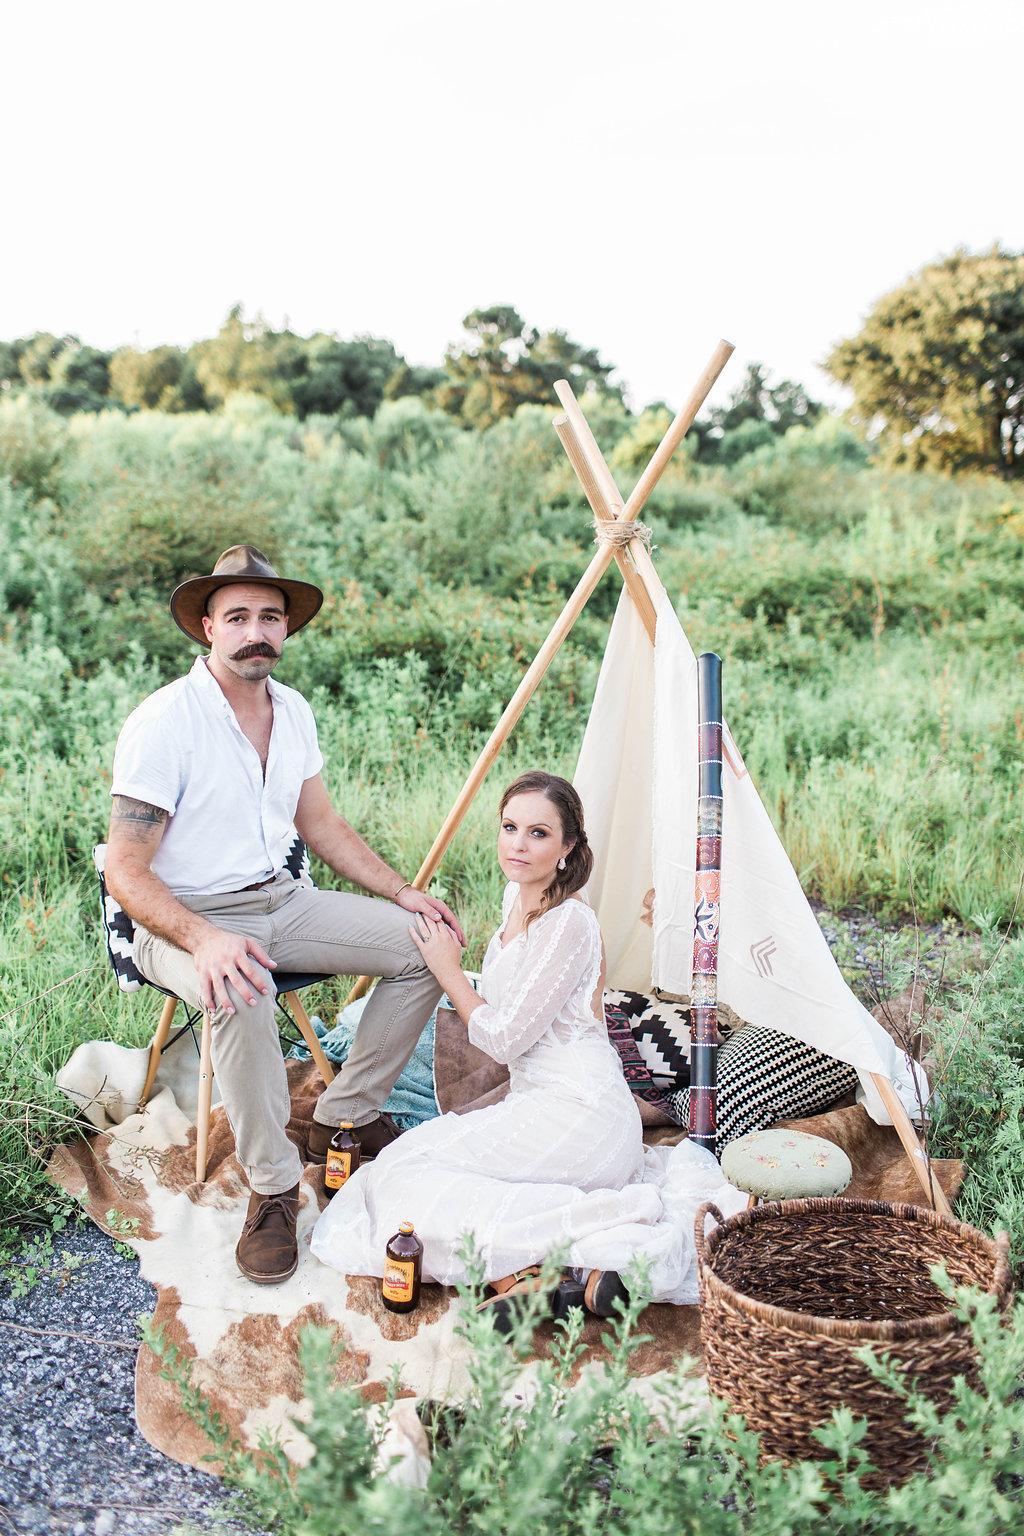 apt-b-photography-ivory-and-beau-bridal-boutique-anna-campbell-isobelle-australian-wedding-the-collins-quarter-savannah-wedding-savannah-weddings-savannah-florist-savannah-bridal-savannah-event-designer-savannah-wedding-dresses-outback-wedding-32.jpg